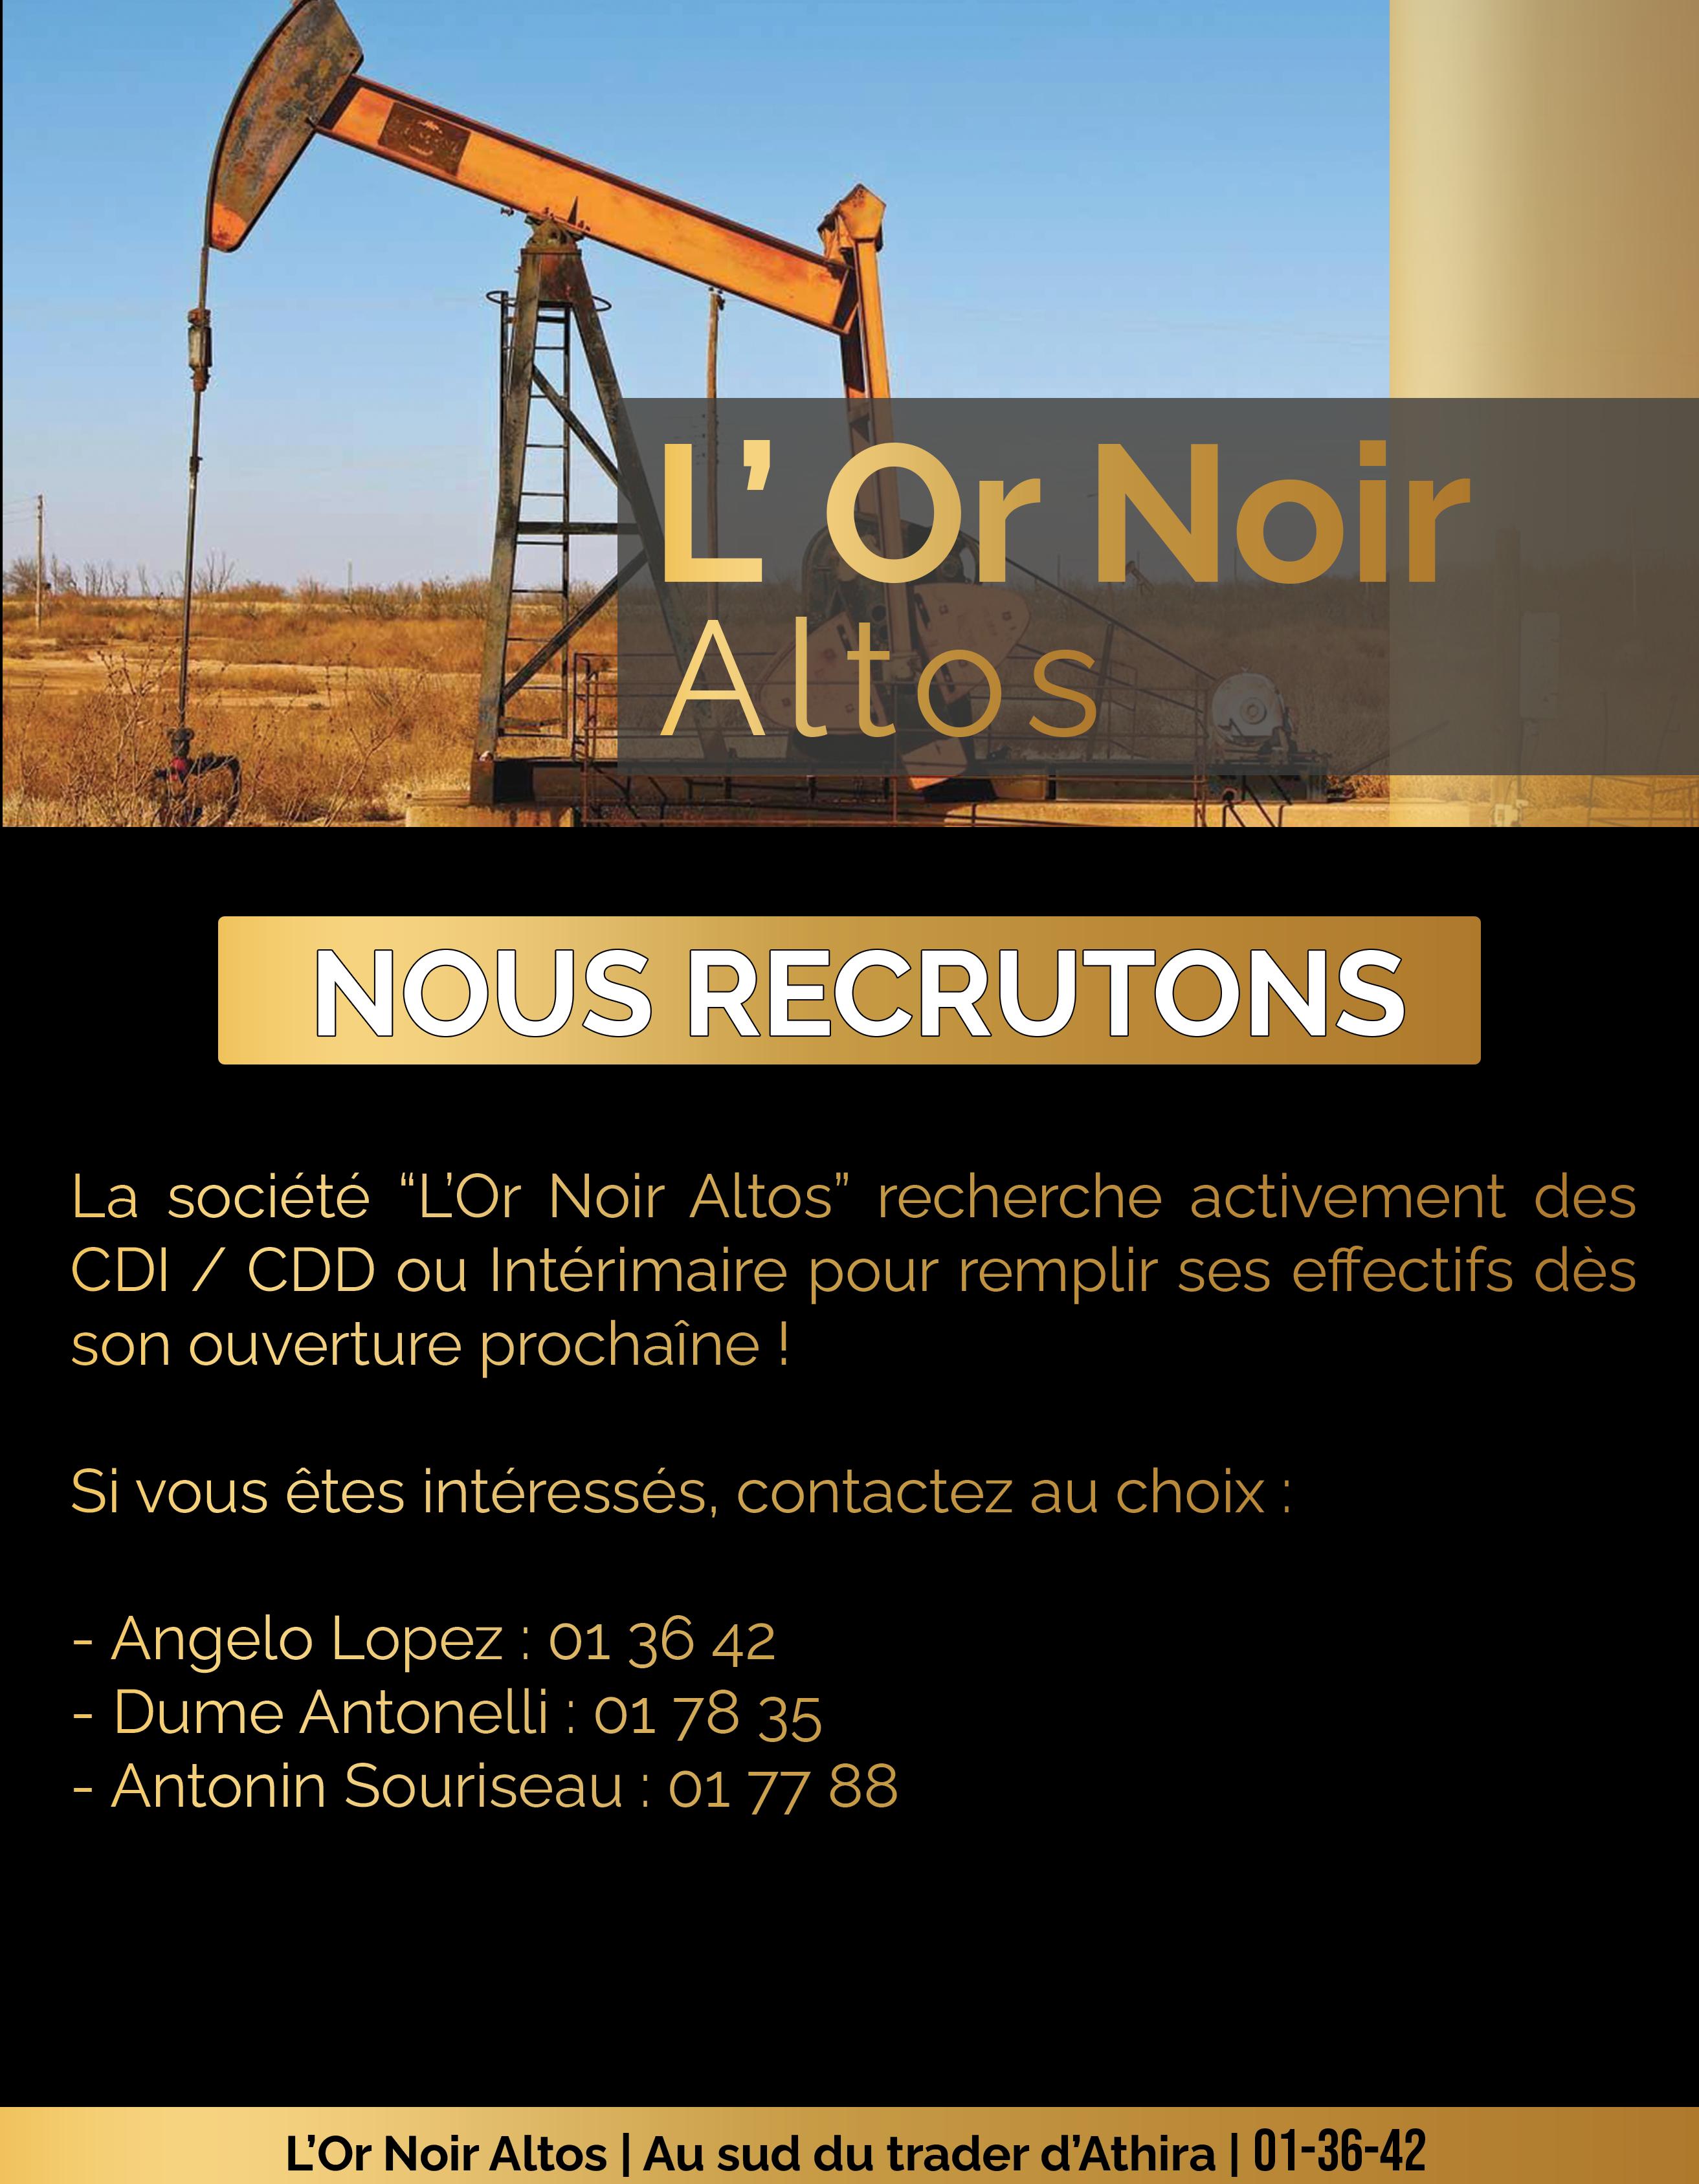 Or Noir Altos Recrutement.png